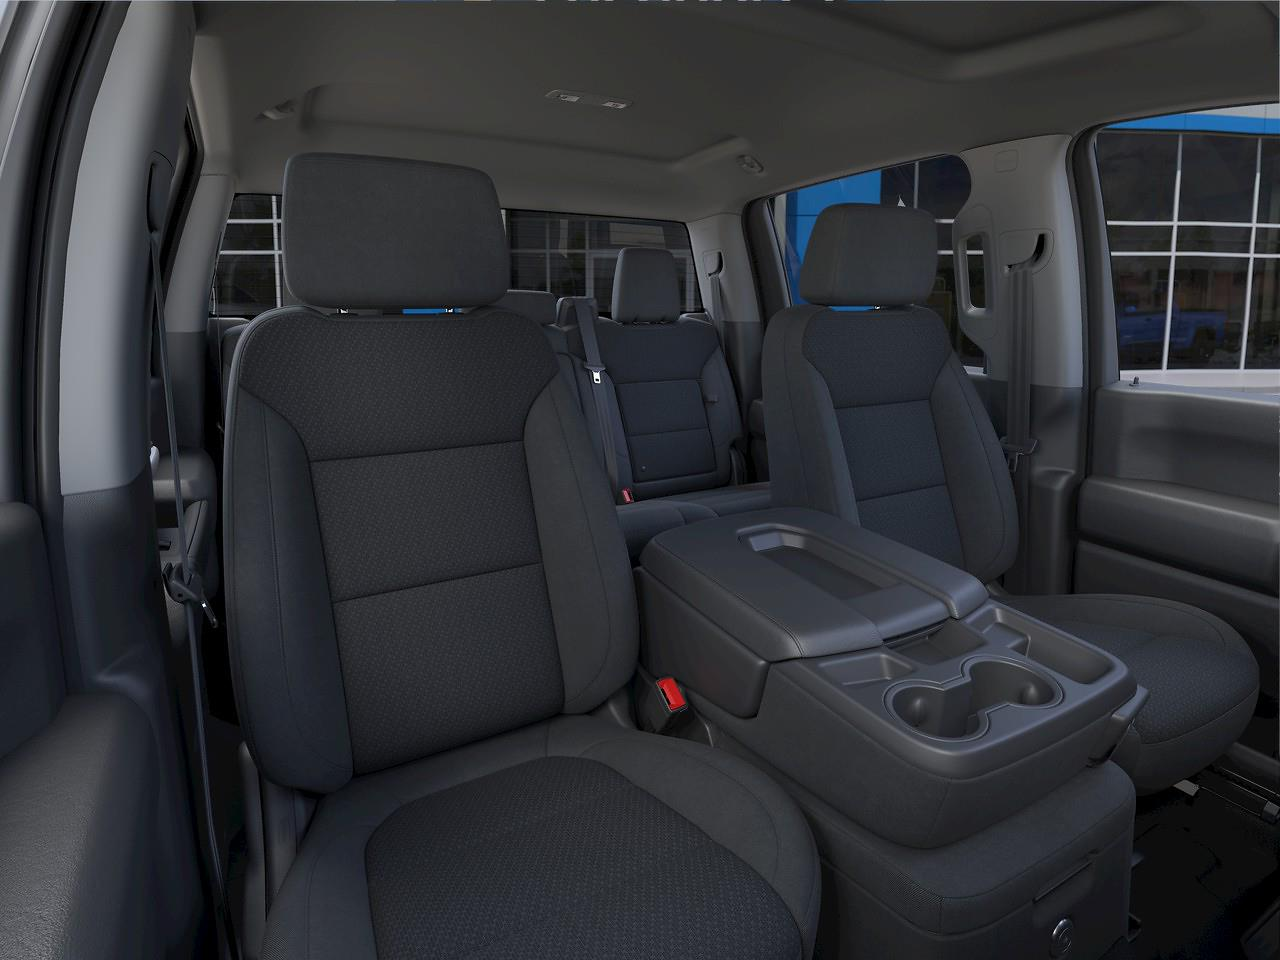 2021 Chevrolet Silverado 2500 Crew Cab 4x4, Pickup #Q210448 - photo 13